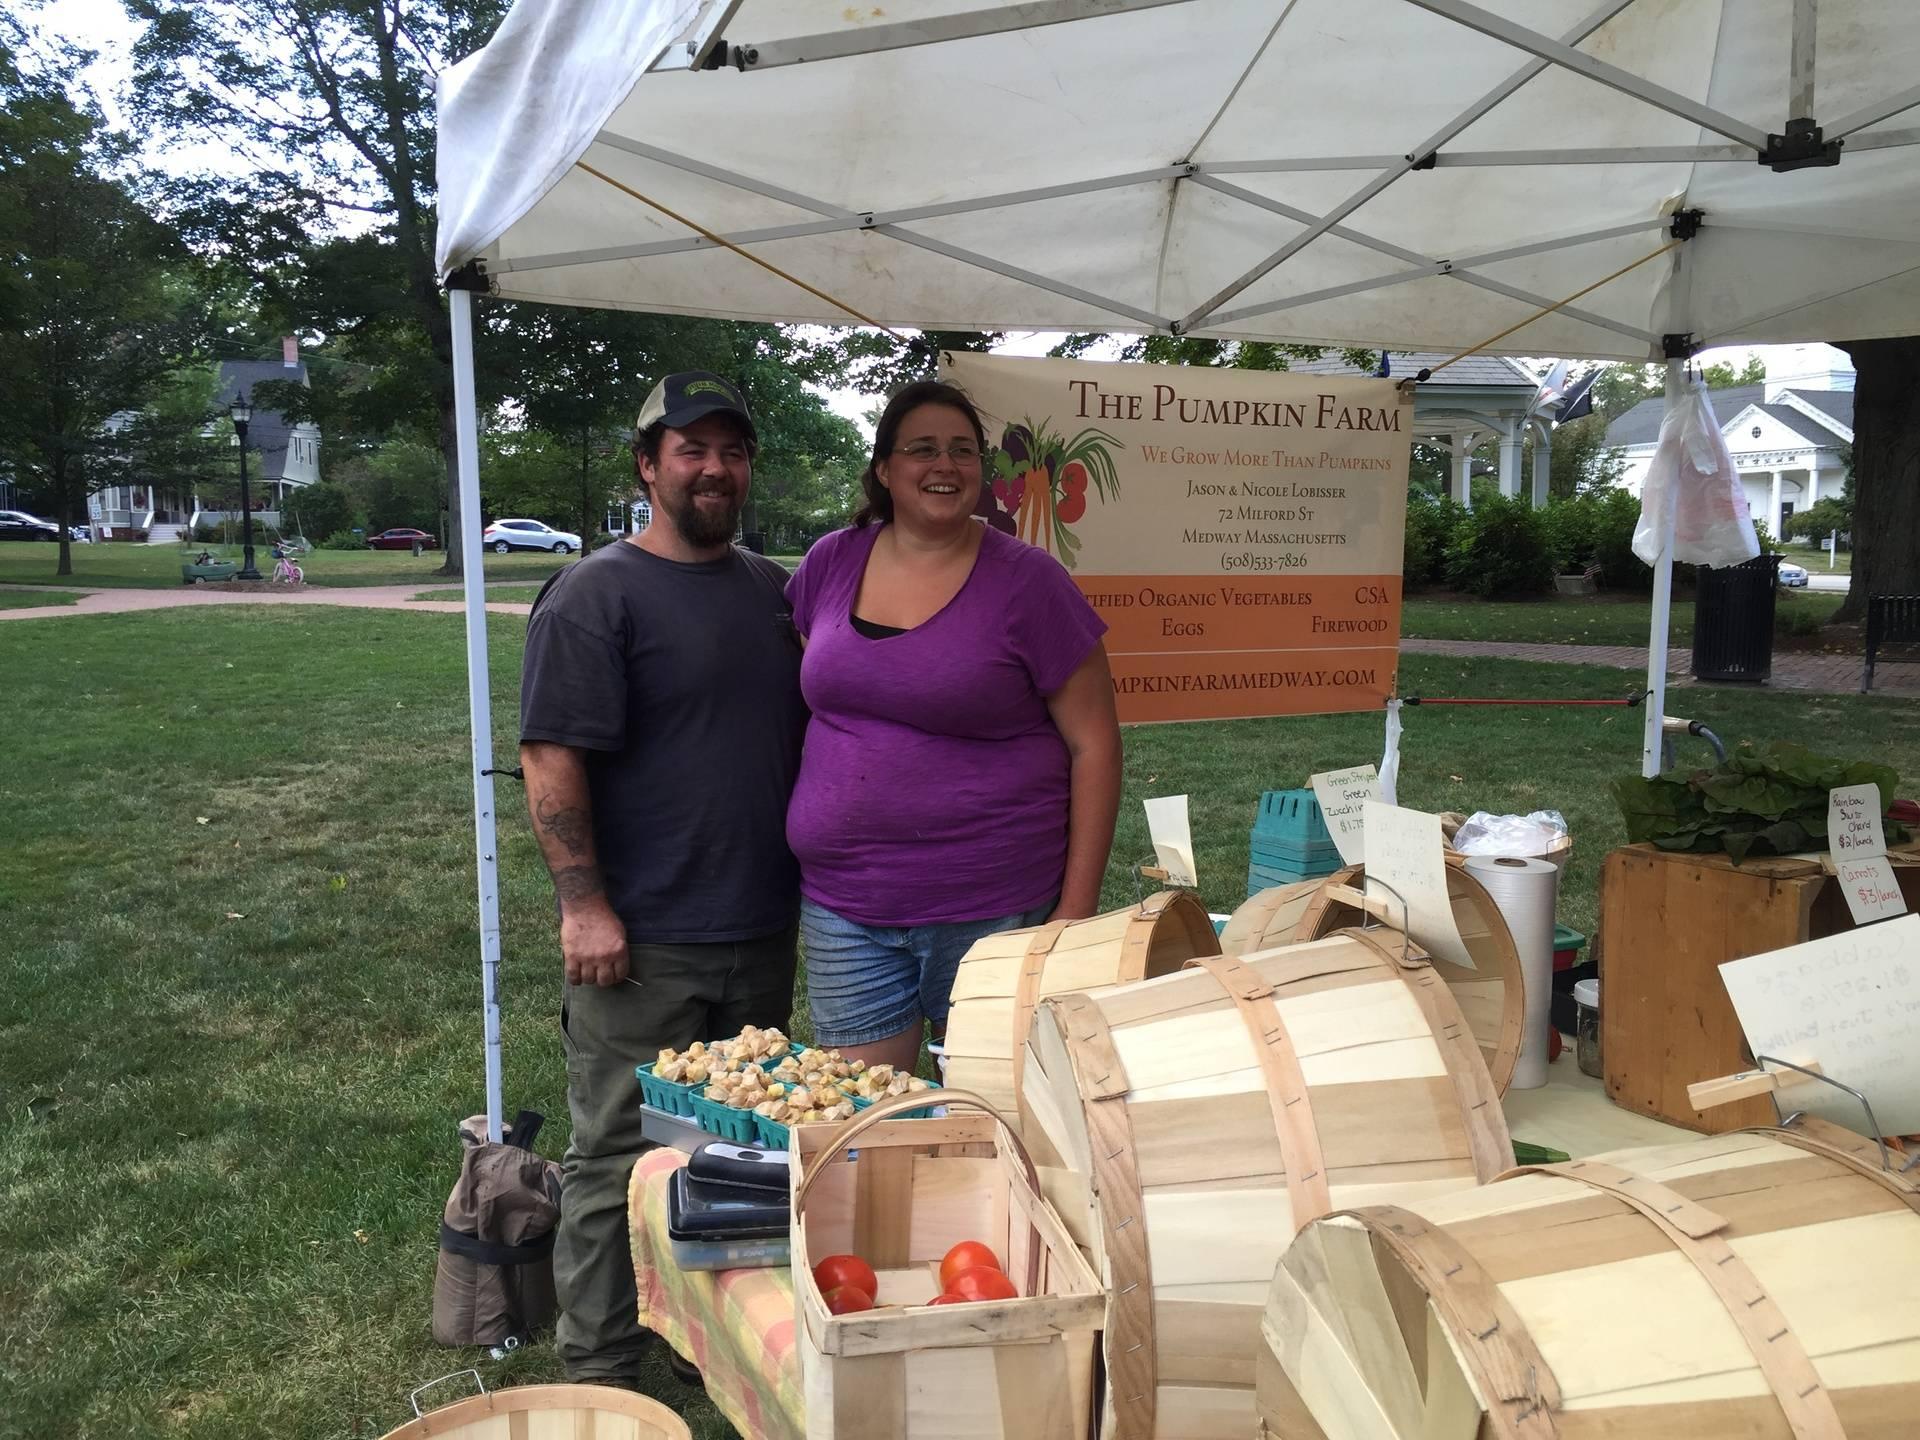 Jason and Nicole Lobisser from the Pumpkin Farm